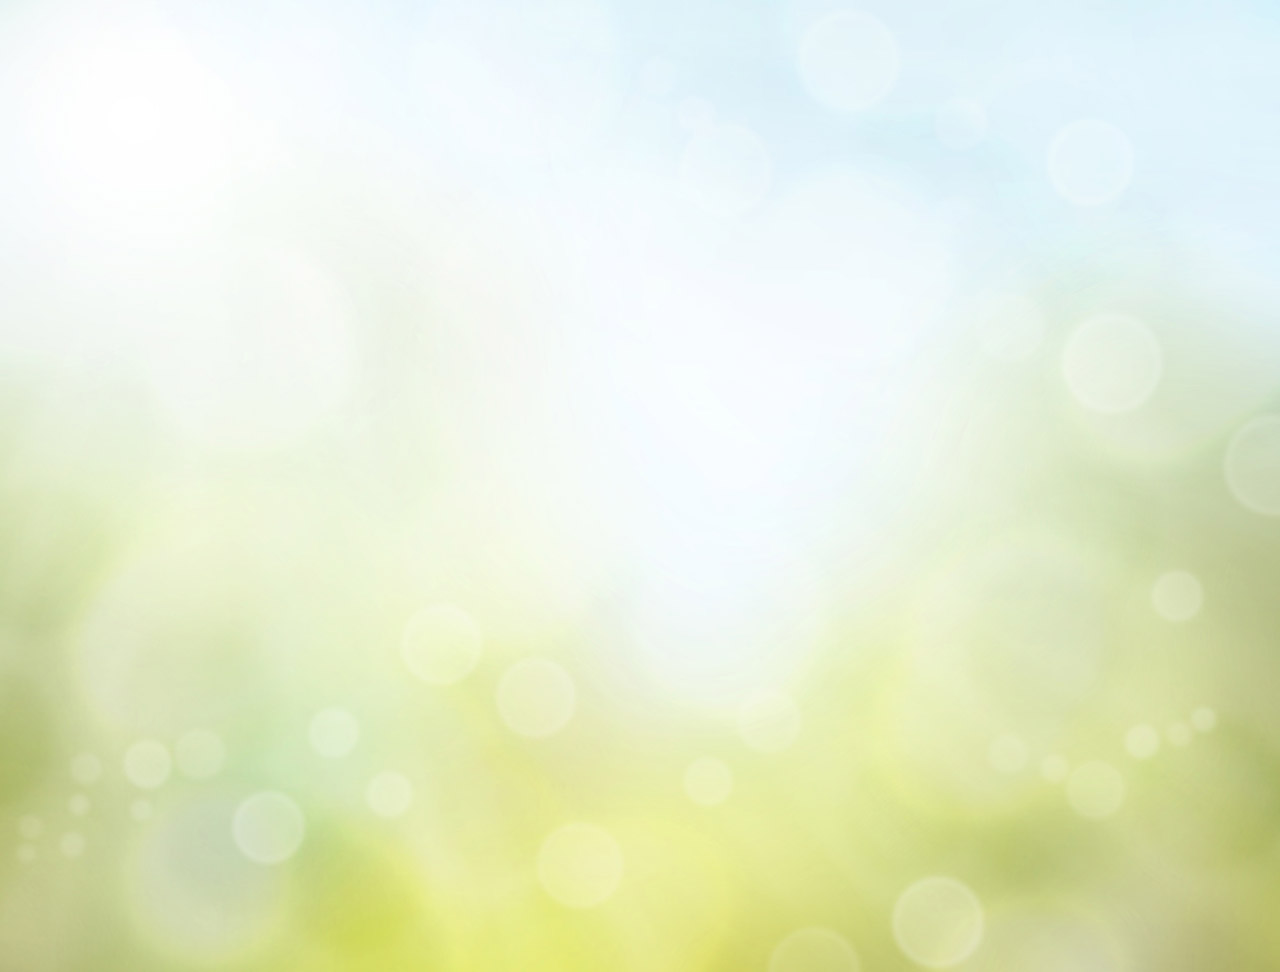 fresh spring image for desktop